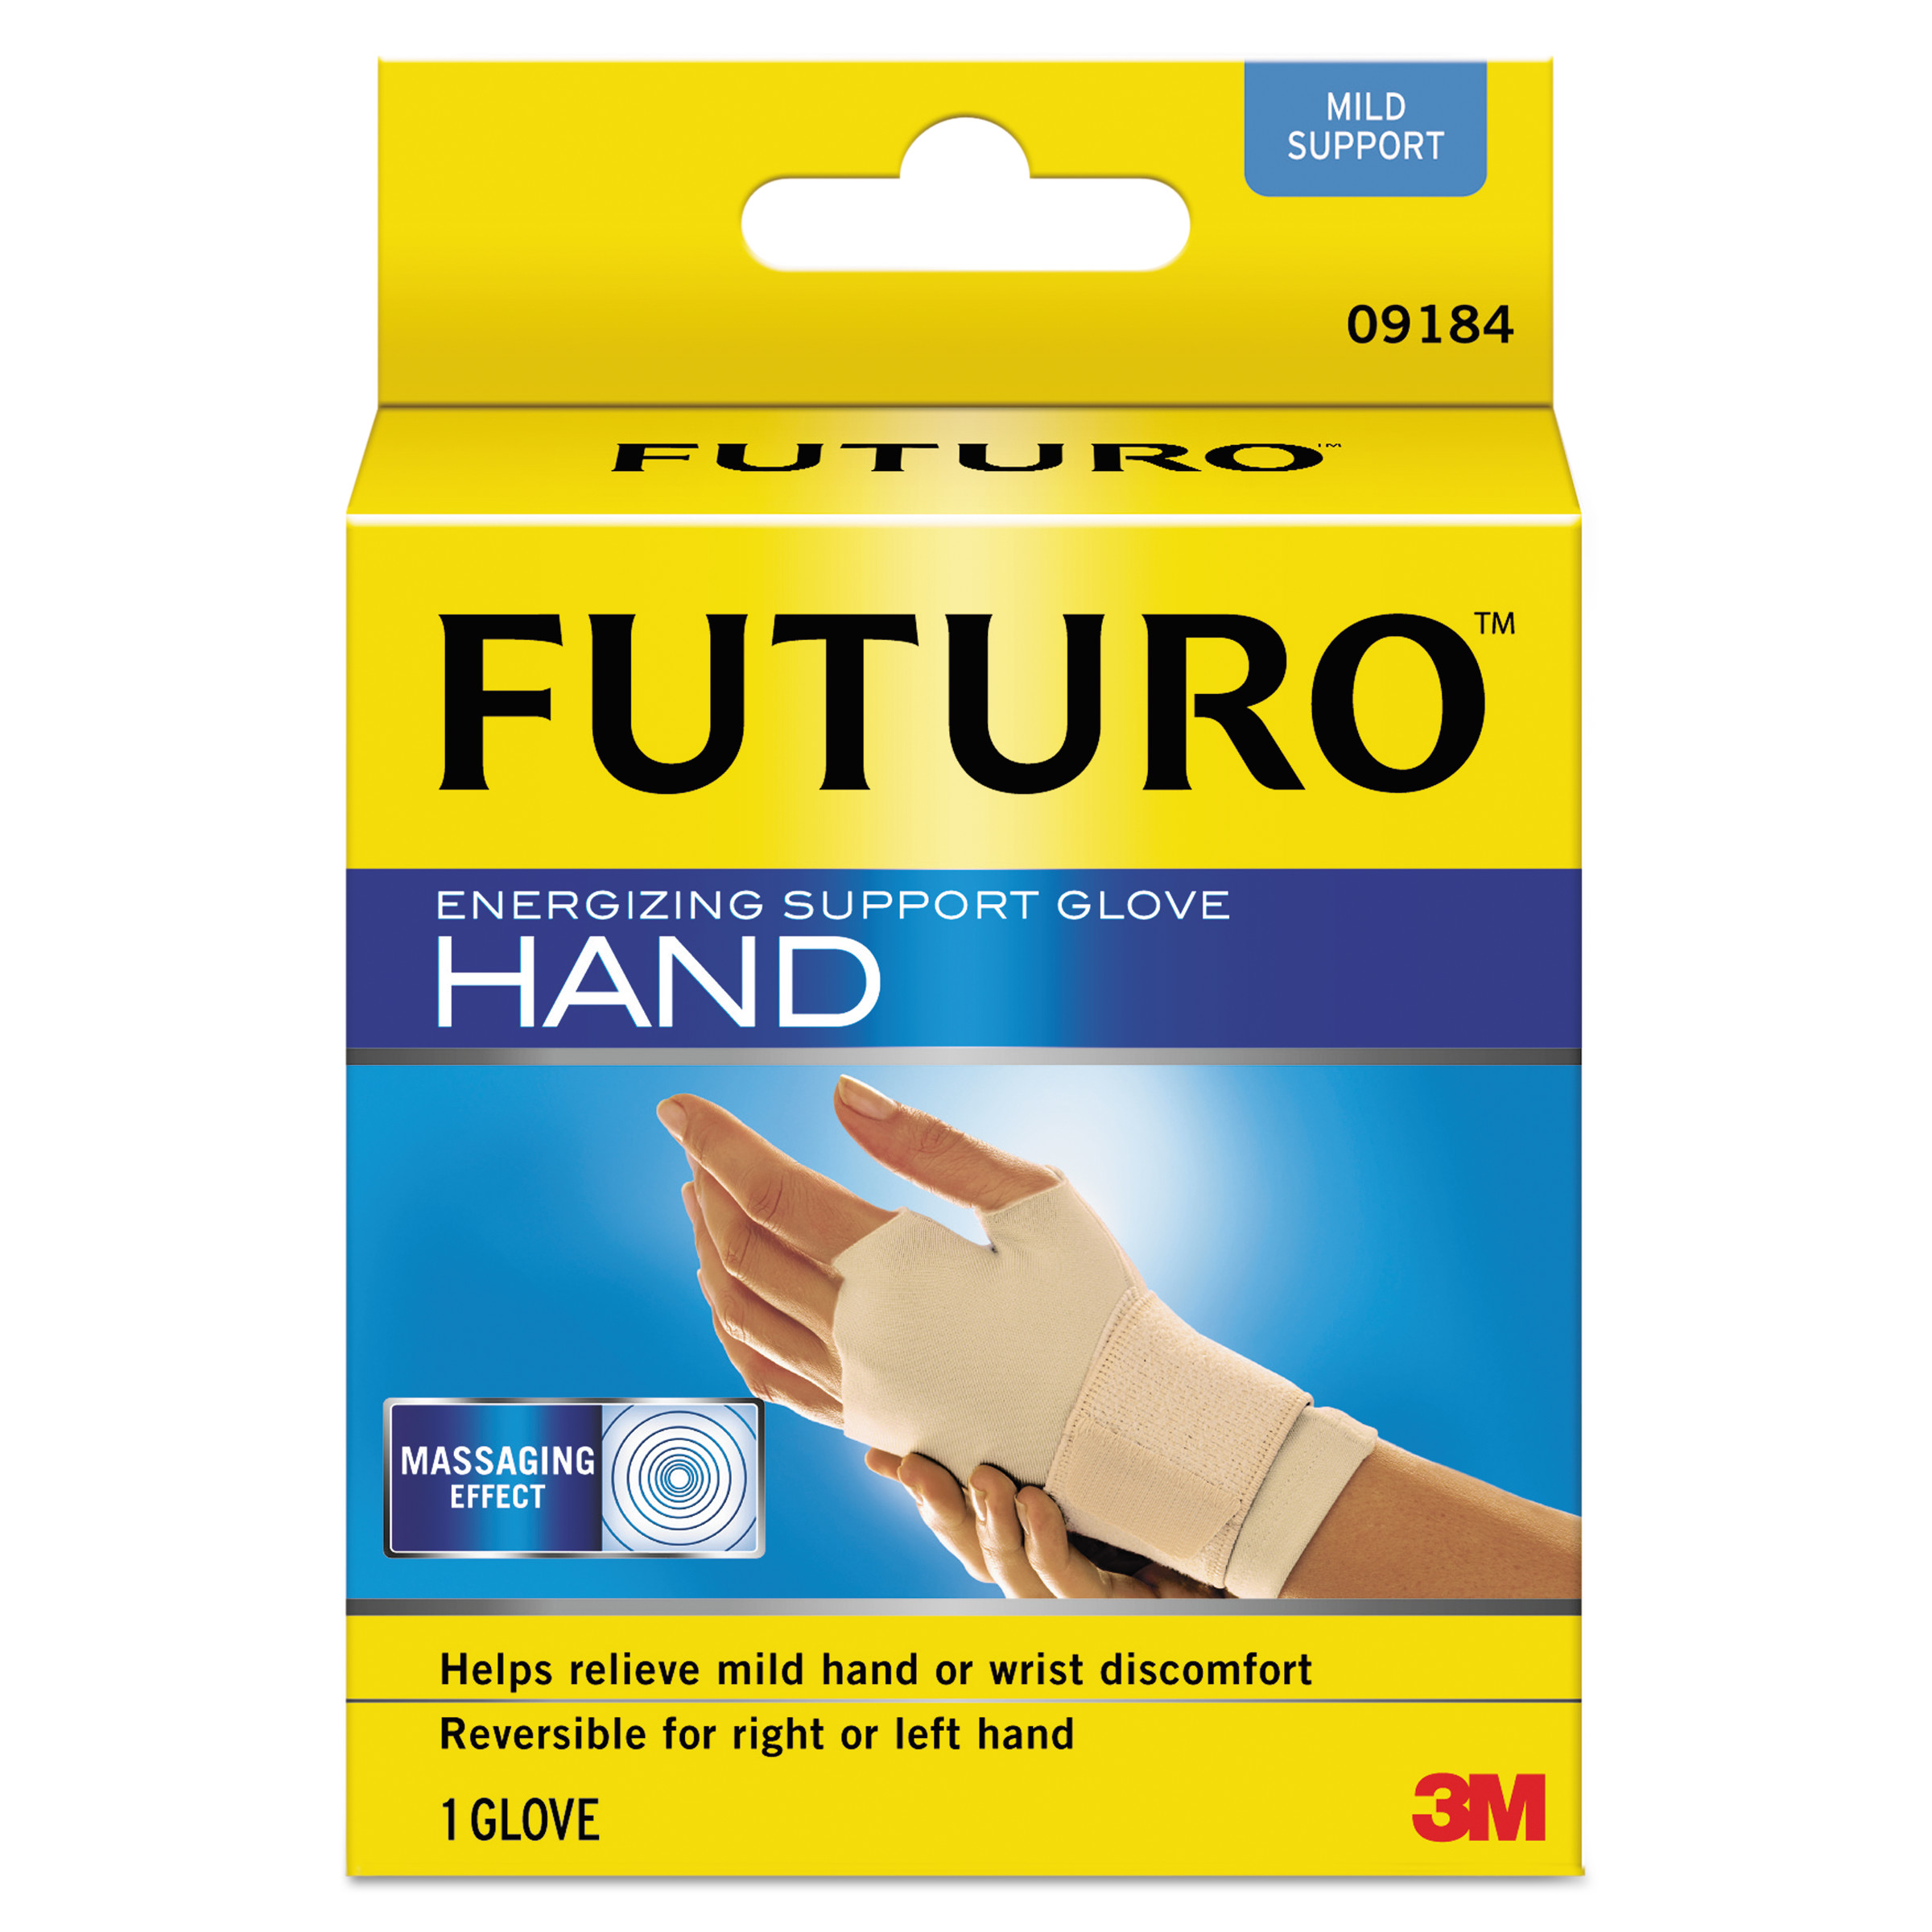 "FUTURO Energizing Support Glove, Medium, Palm Size 7 1/2"" - 8 1/2"", Tan"